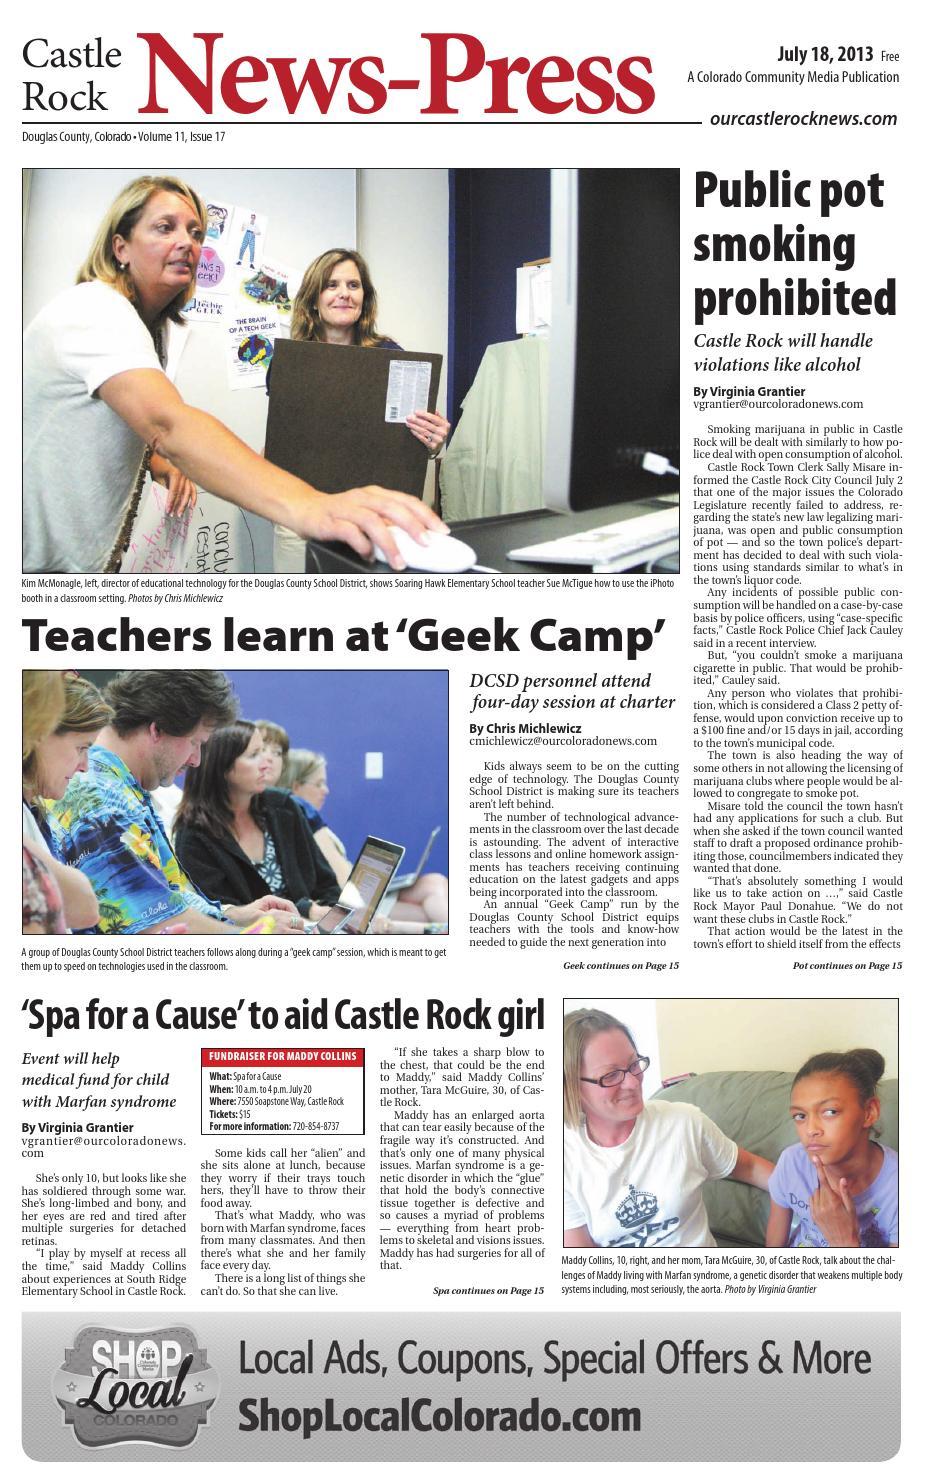 Spr303274che Weihnachten.Castle Rock News Press 0718 By Colorado Community Media Issuu